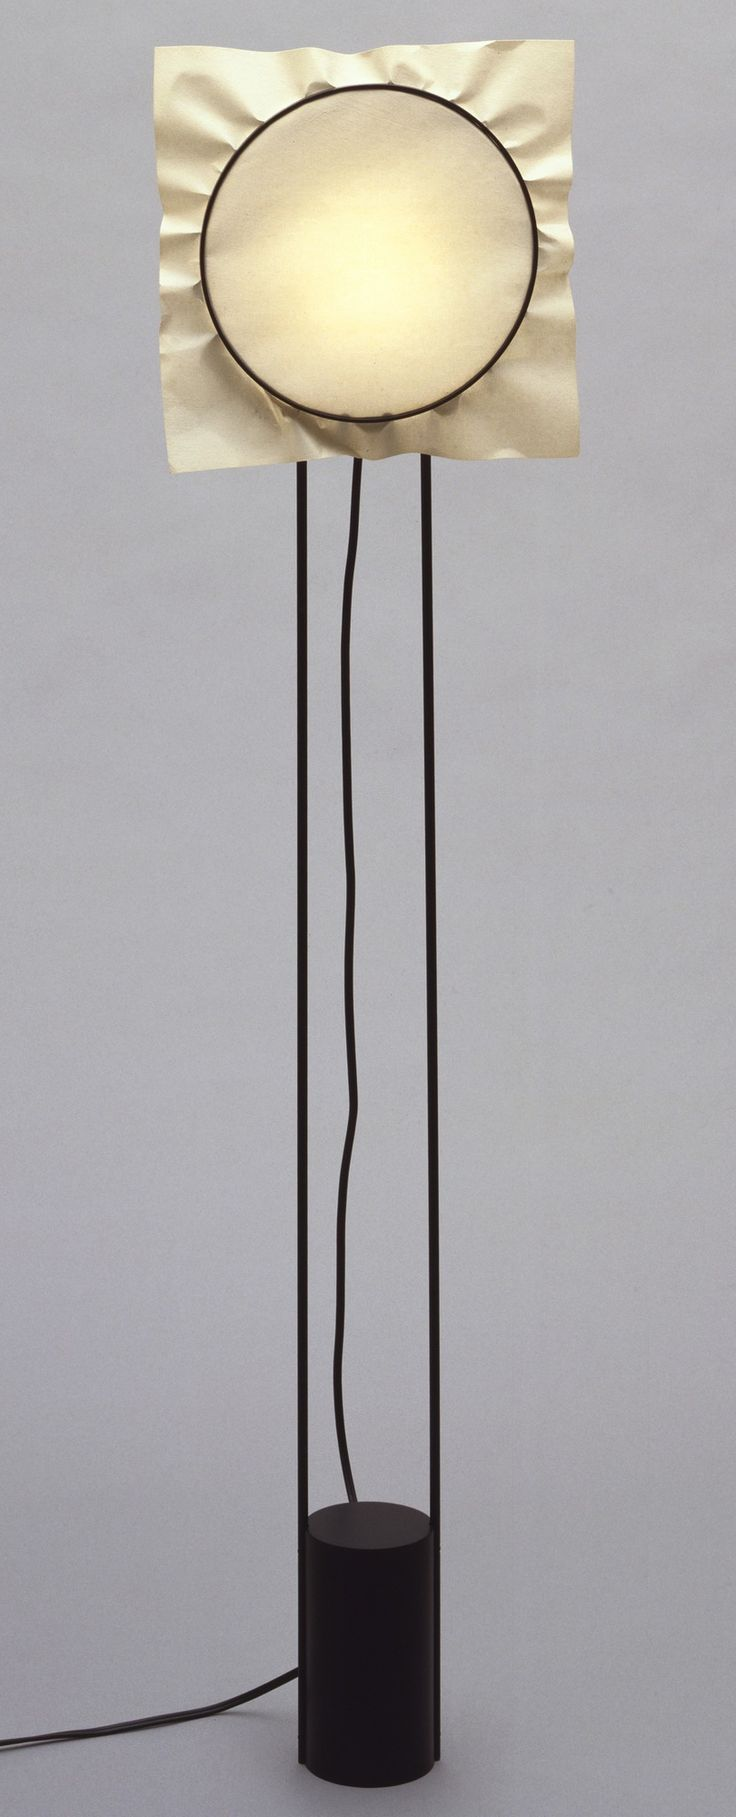 V lorenzo porcelli carmen basile corona floor lamp 1981